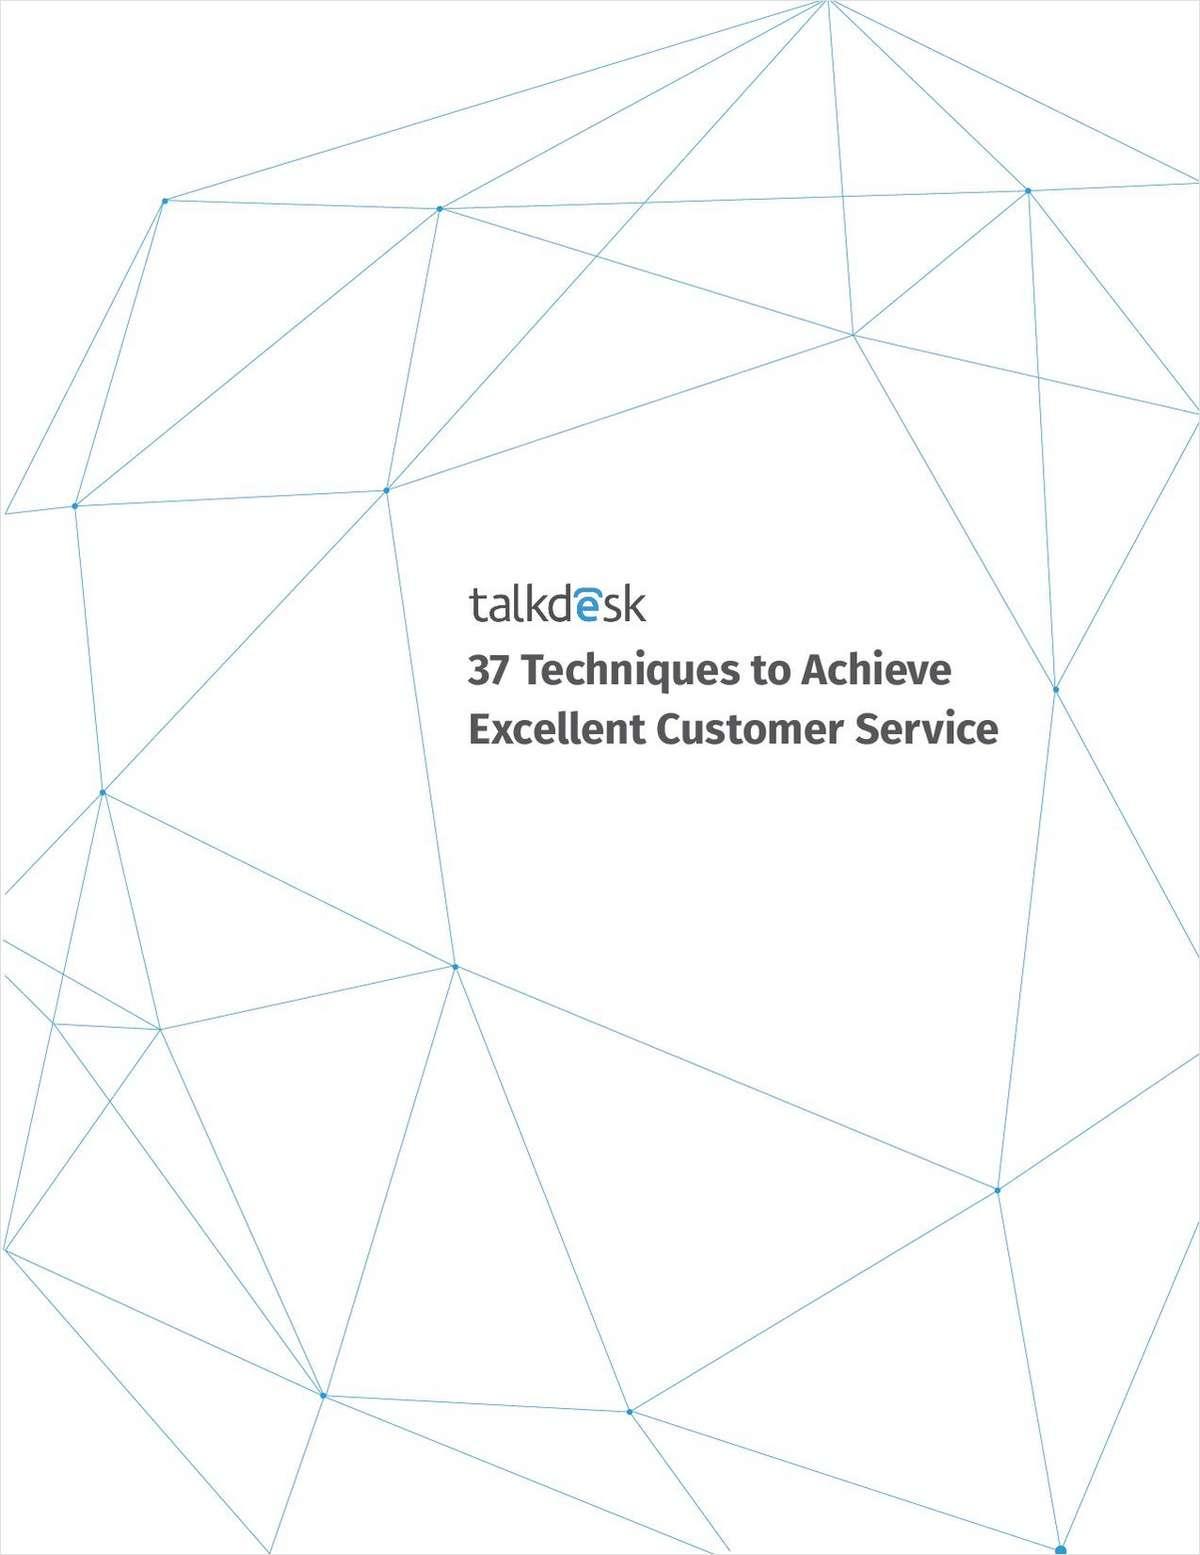 37 Techniques to Achieve Excellent Customer Service